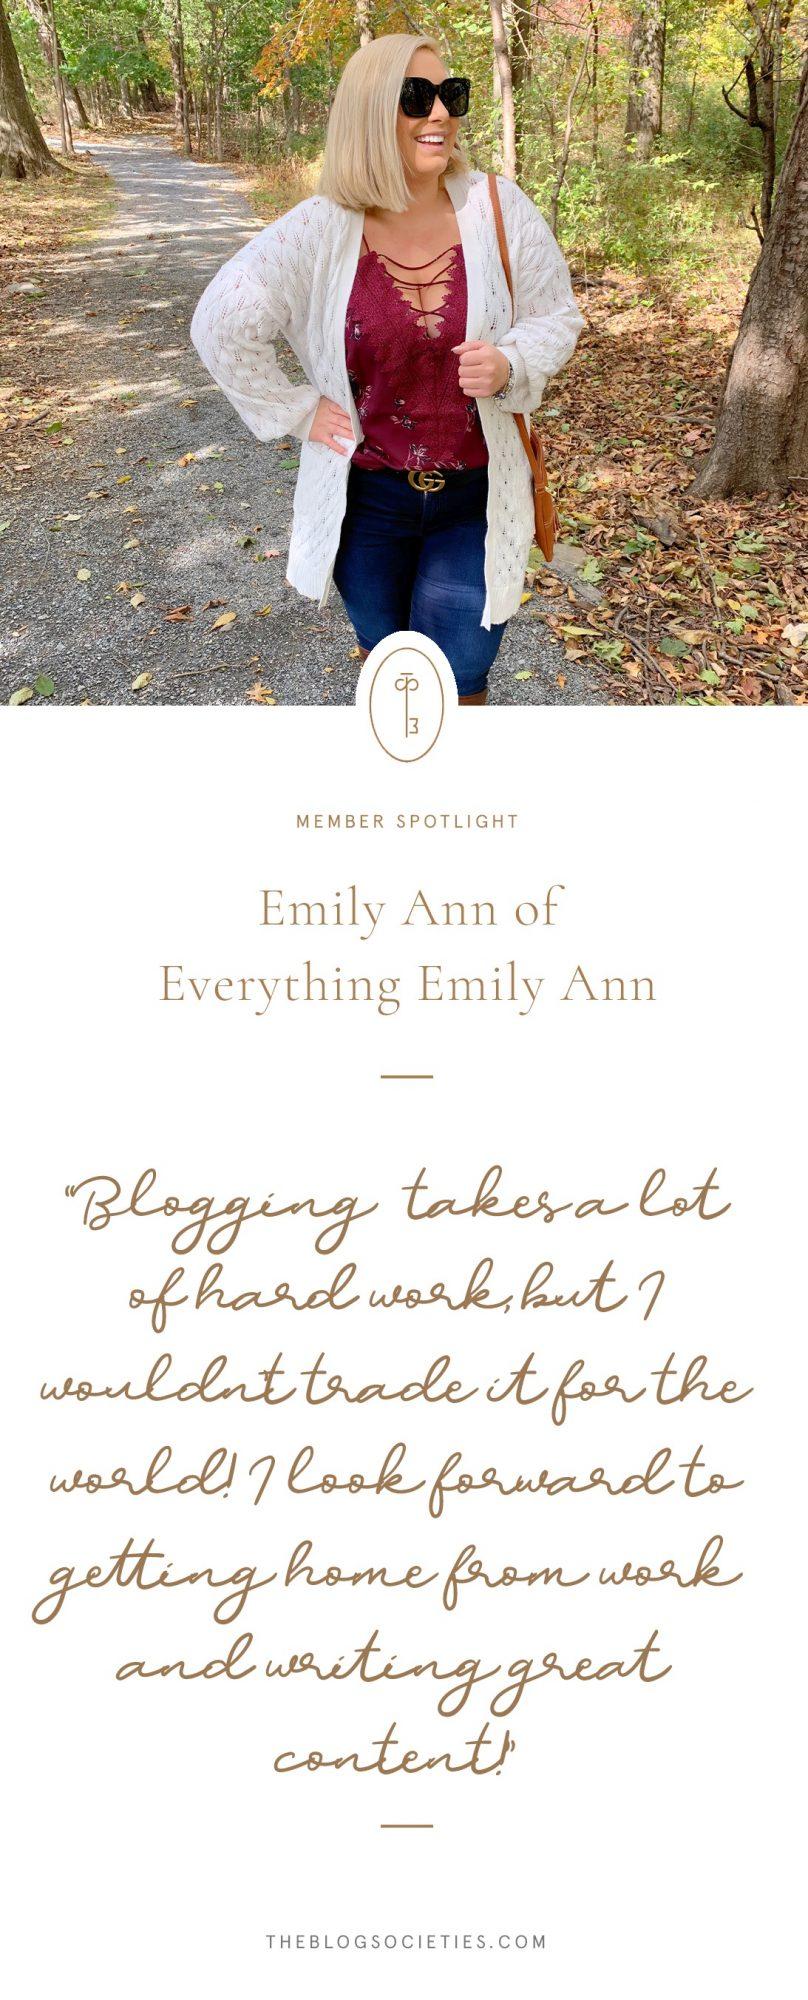 Emily of Everything Emily Ann Blog